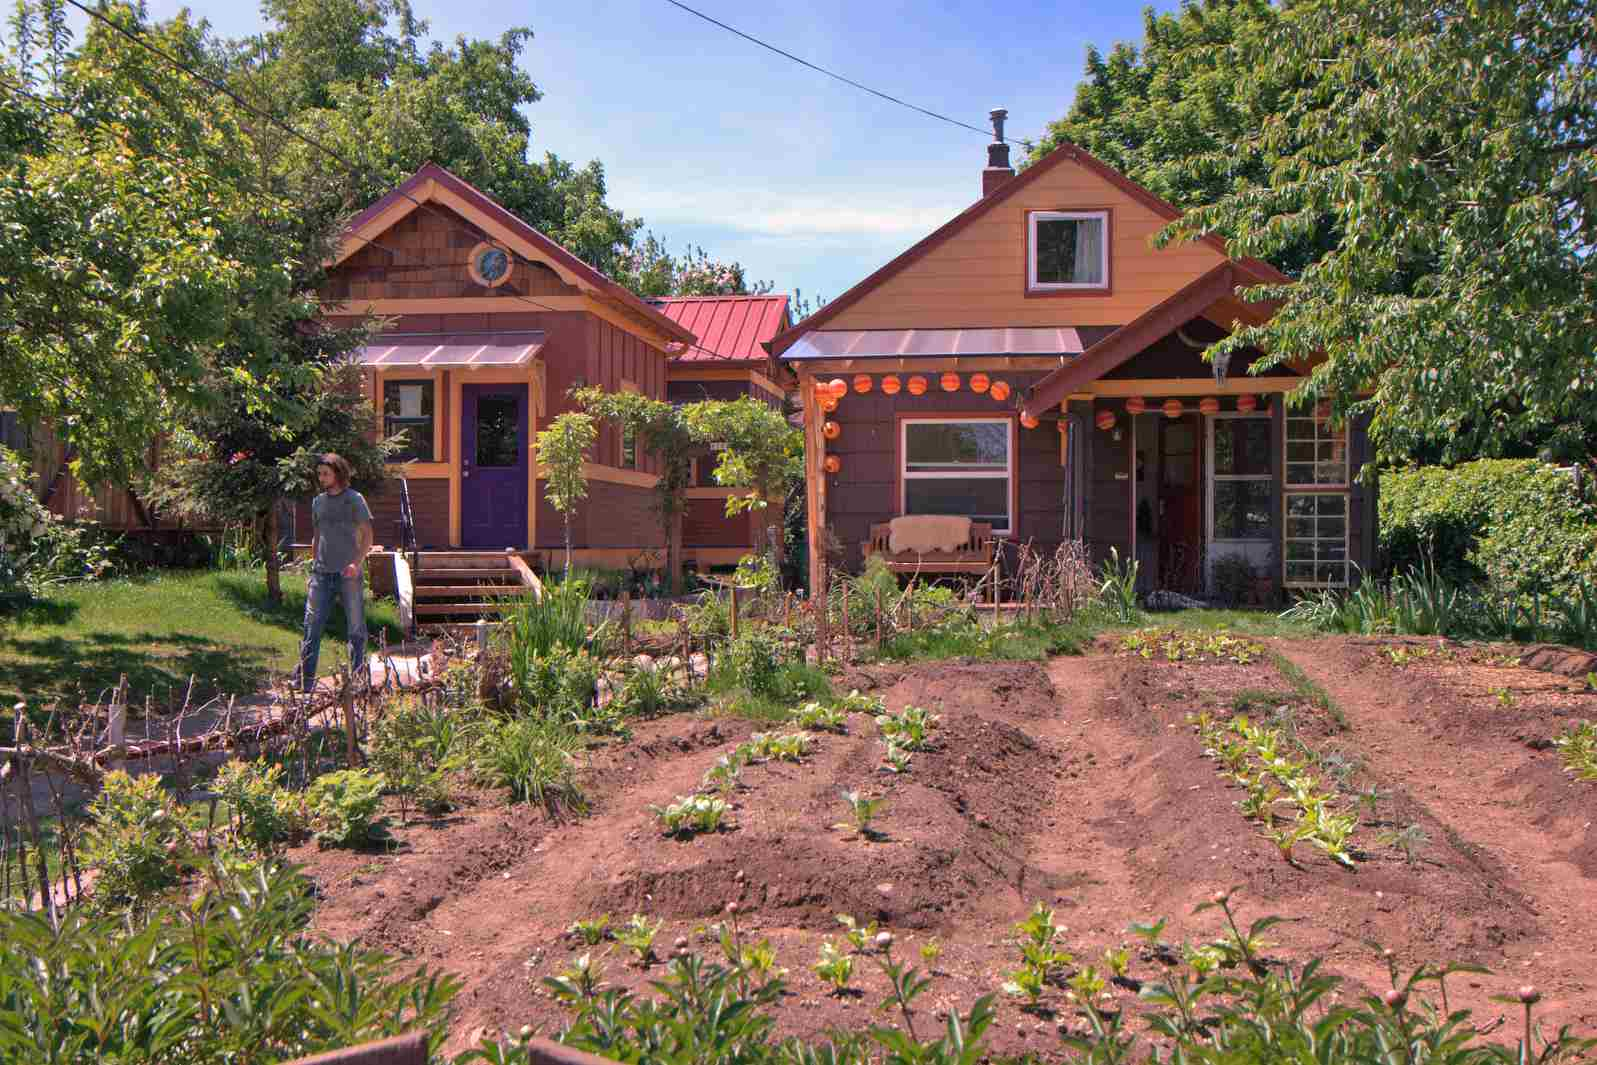 13 Livable Tiny House Communities